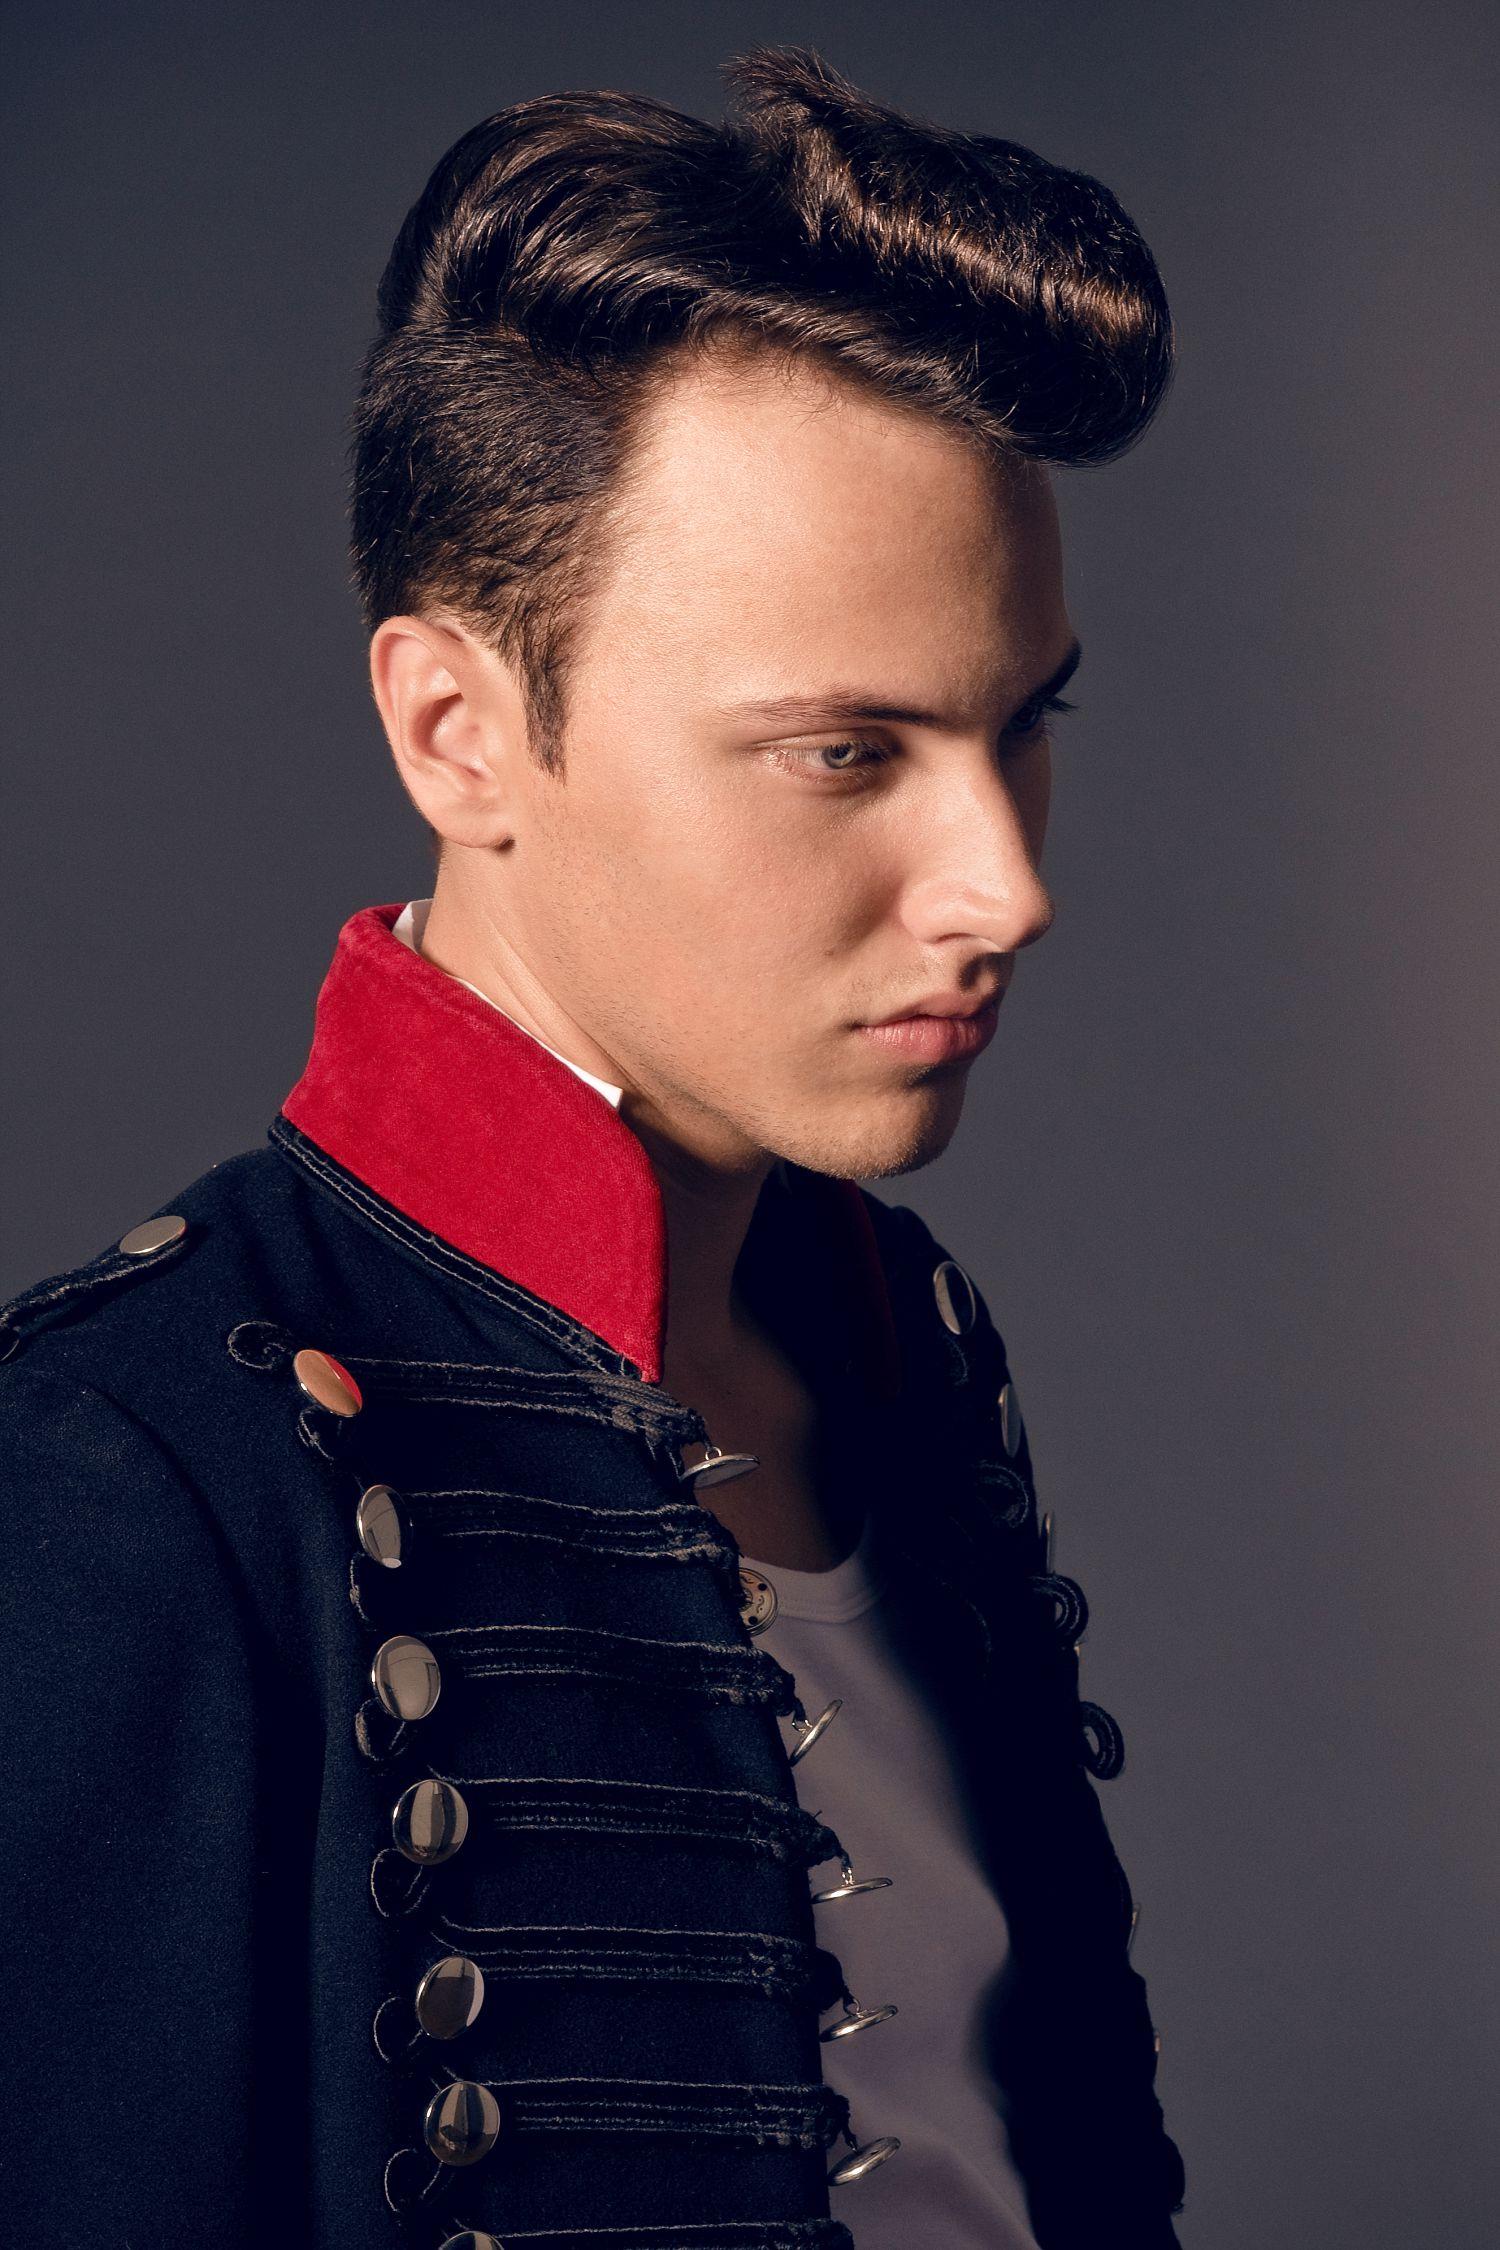 model  Denis  hair   Marco Arena & Team   make-up  Ira Möller  styling   Hair-Arena  / Corinna Saric